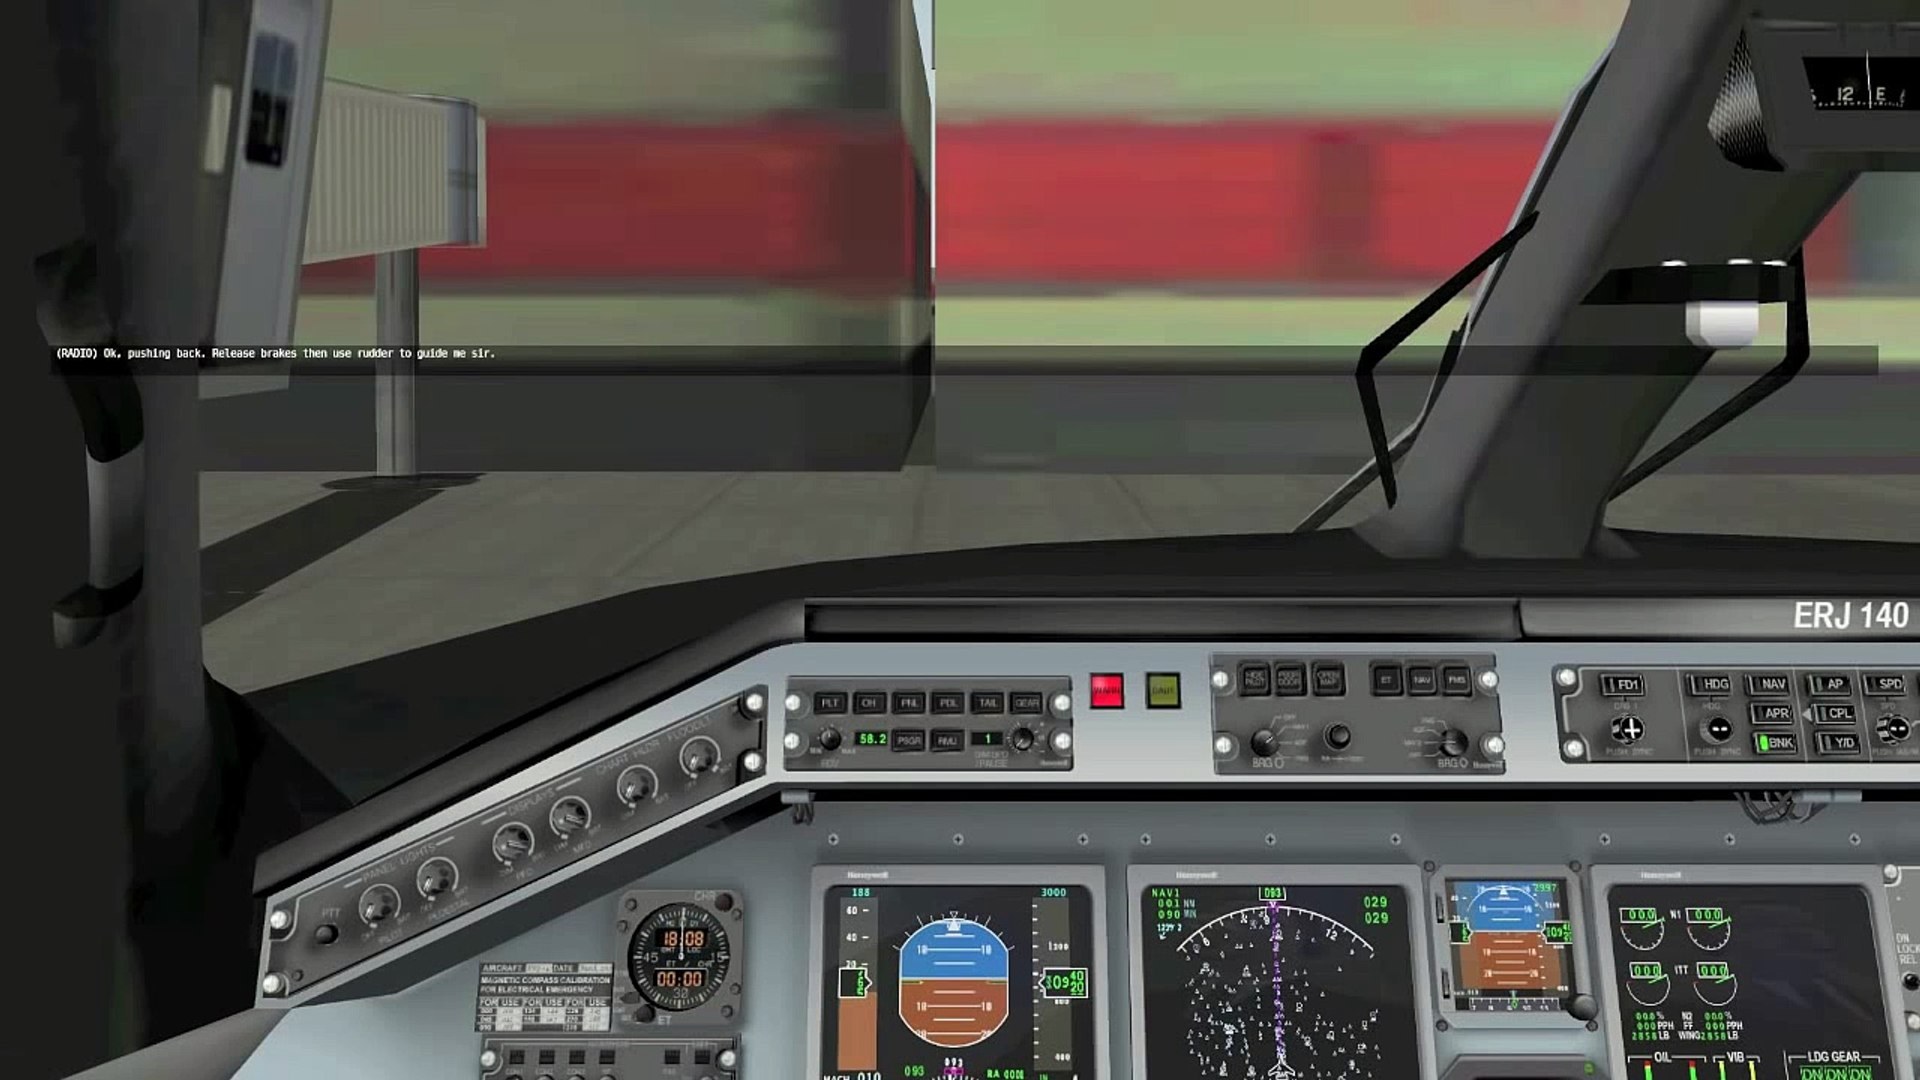 X-Plane Embraer ERJ-140 v2 by Daniel Klaue